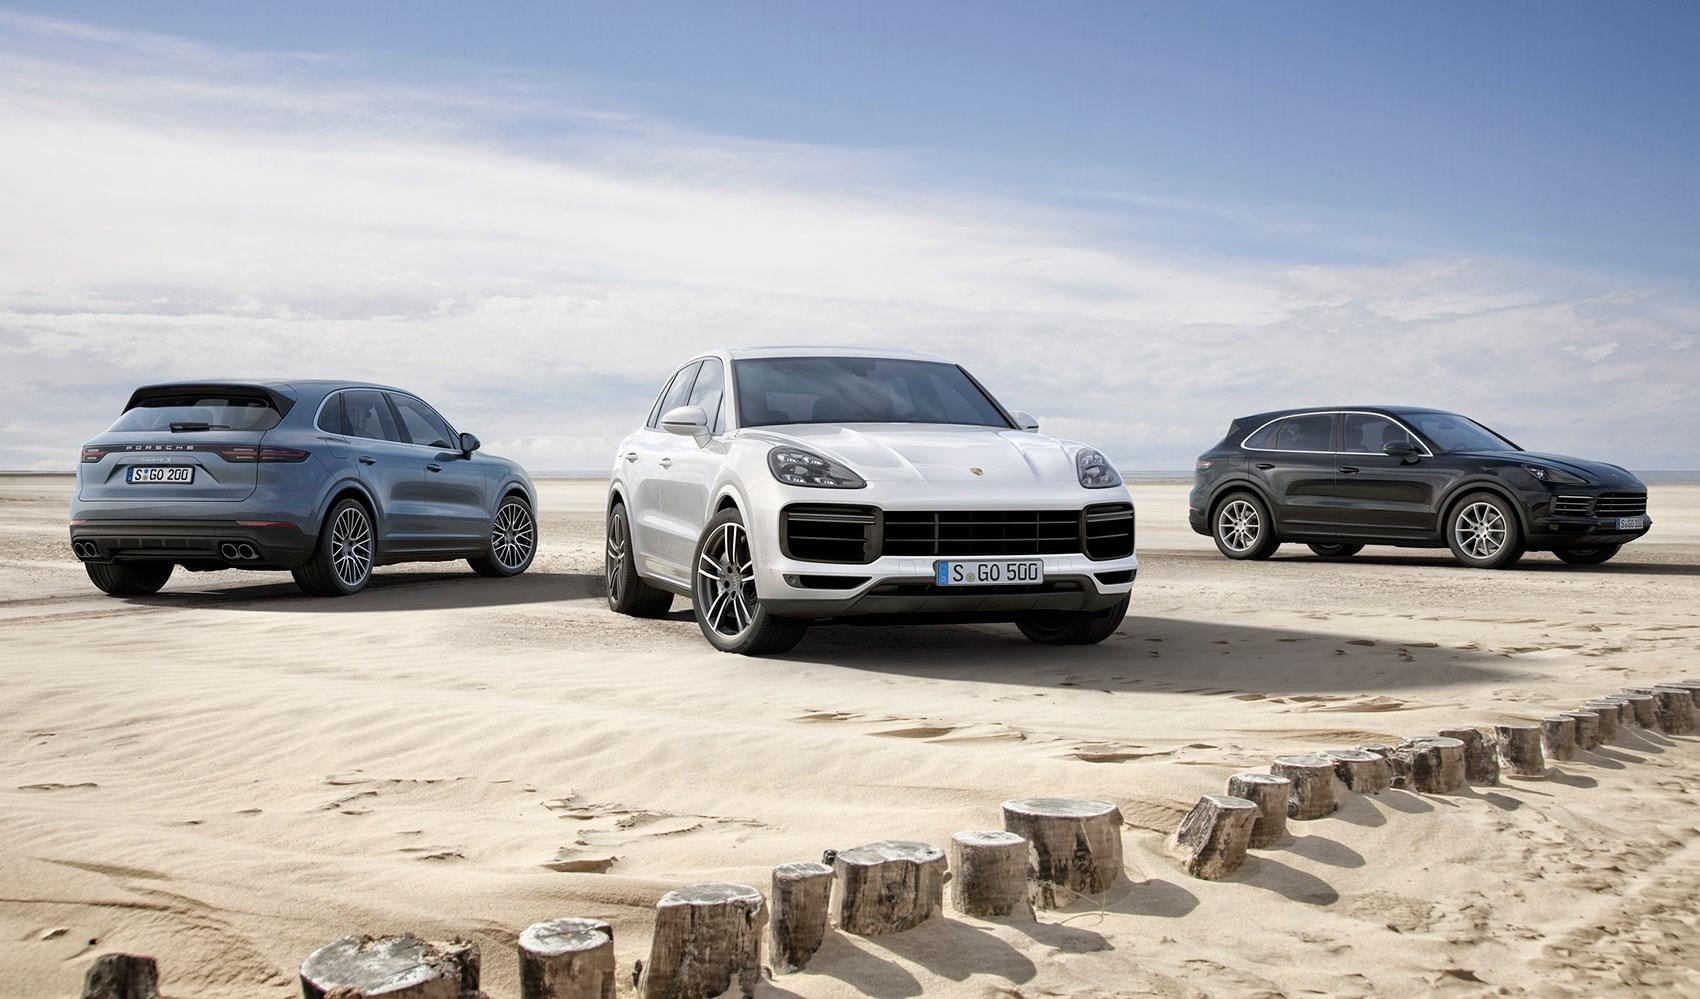 Porsche Cayenne Turbo Puts Other Performance SUVs on Notice